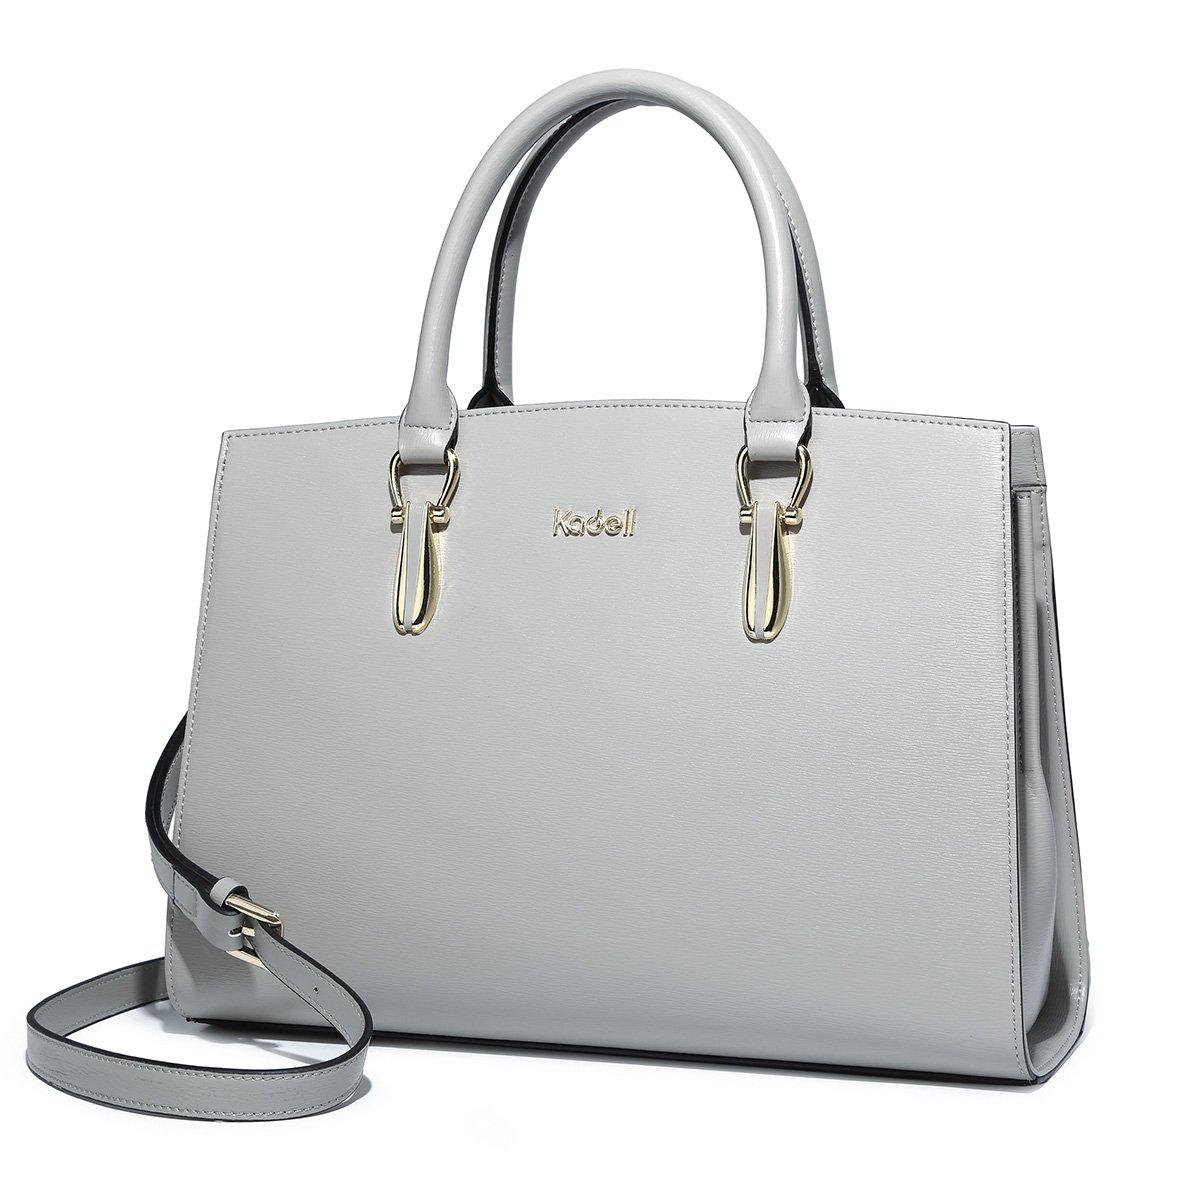 Kadell Elegant Women Handbags Leather Vintage Tote Satchel Shoulder Crossbody Bags Top Handle Purse Grey